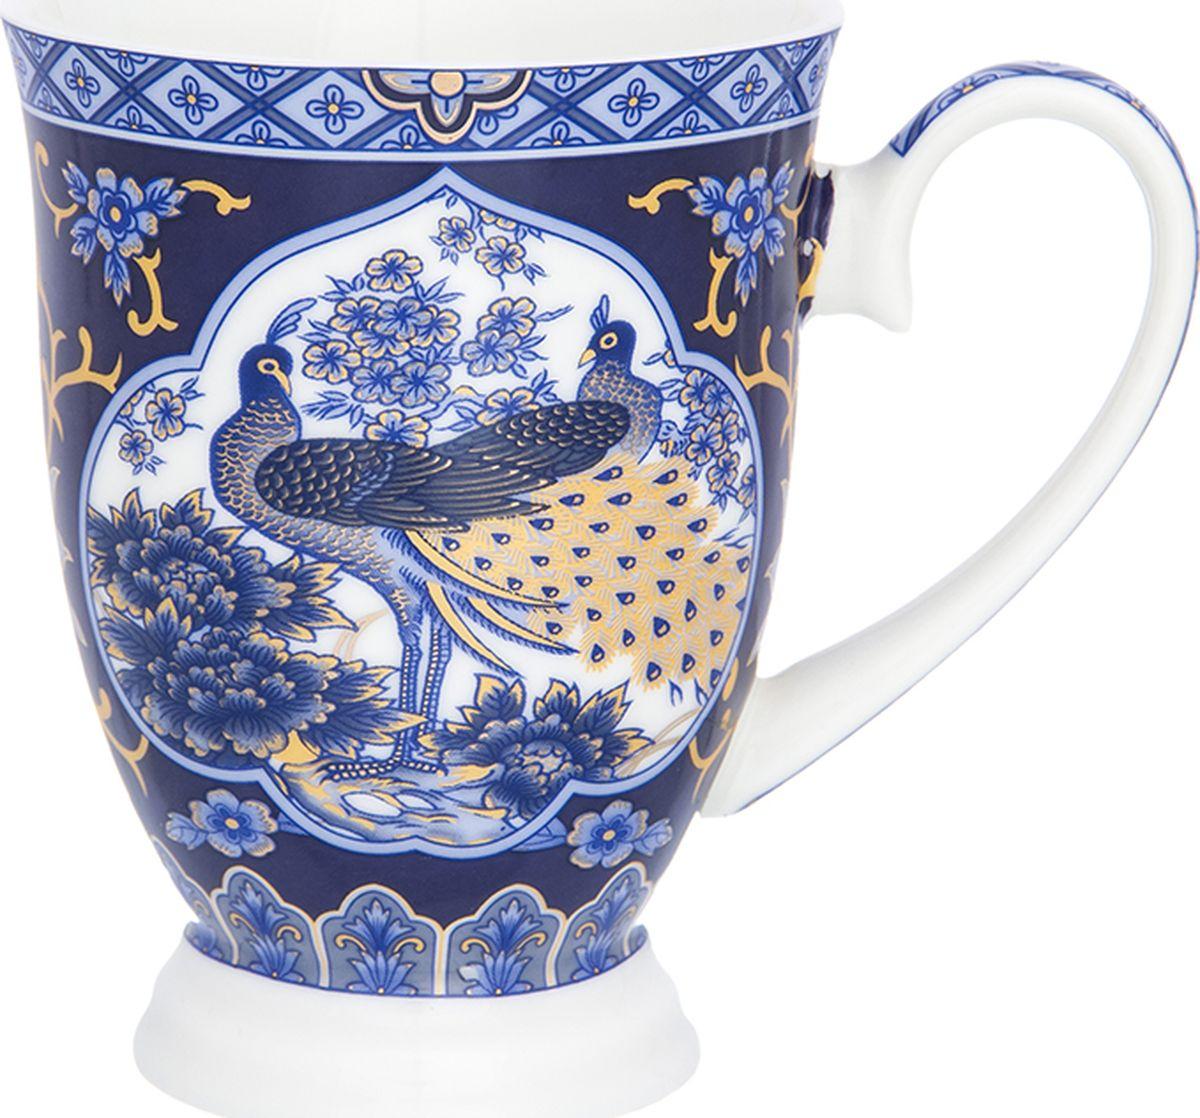 Кружка Elan Gallery Павлин синий, на ножке, 300 мл. 181046